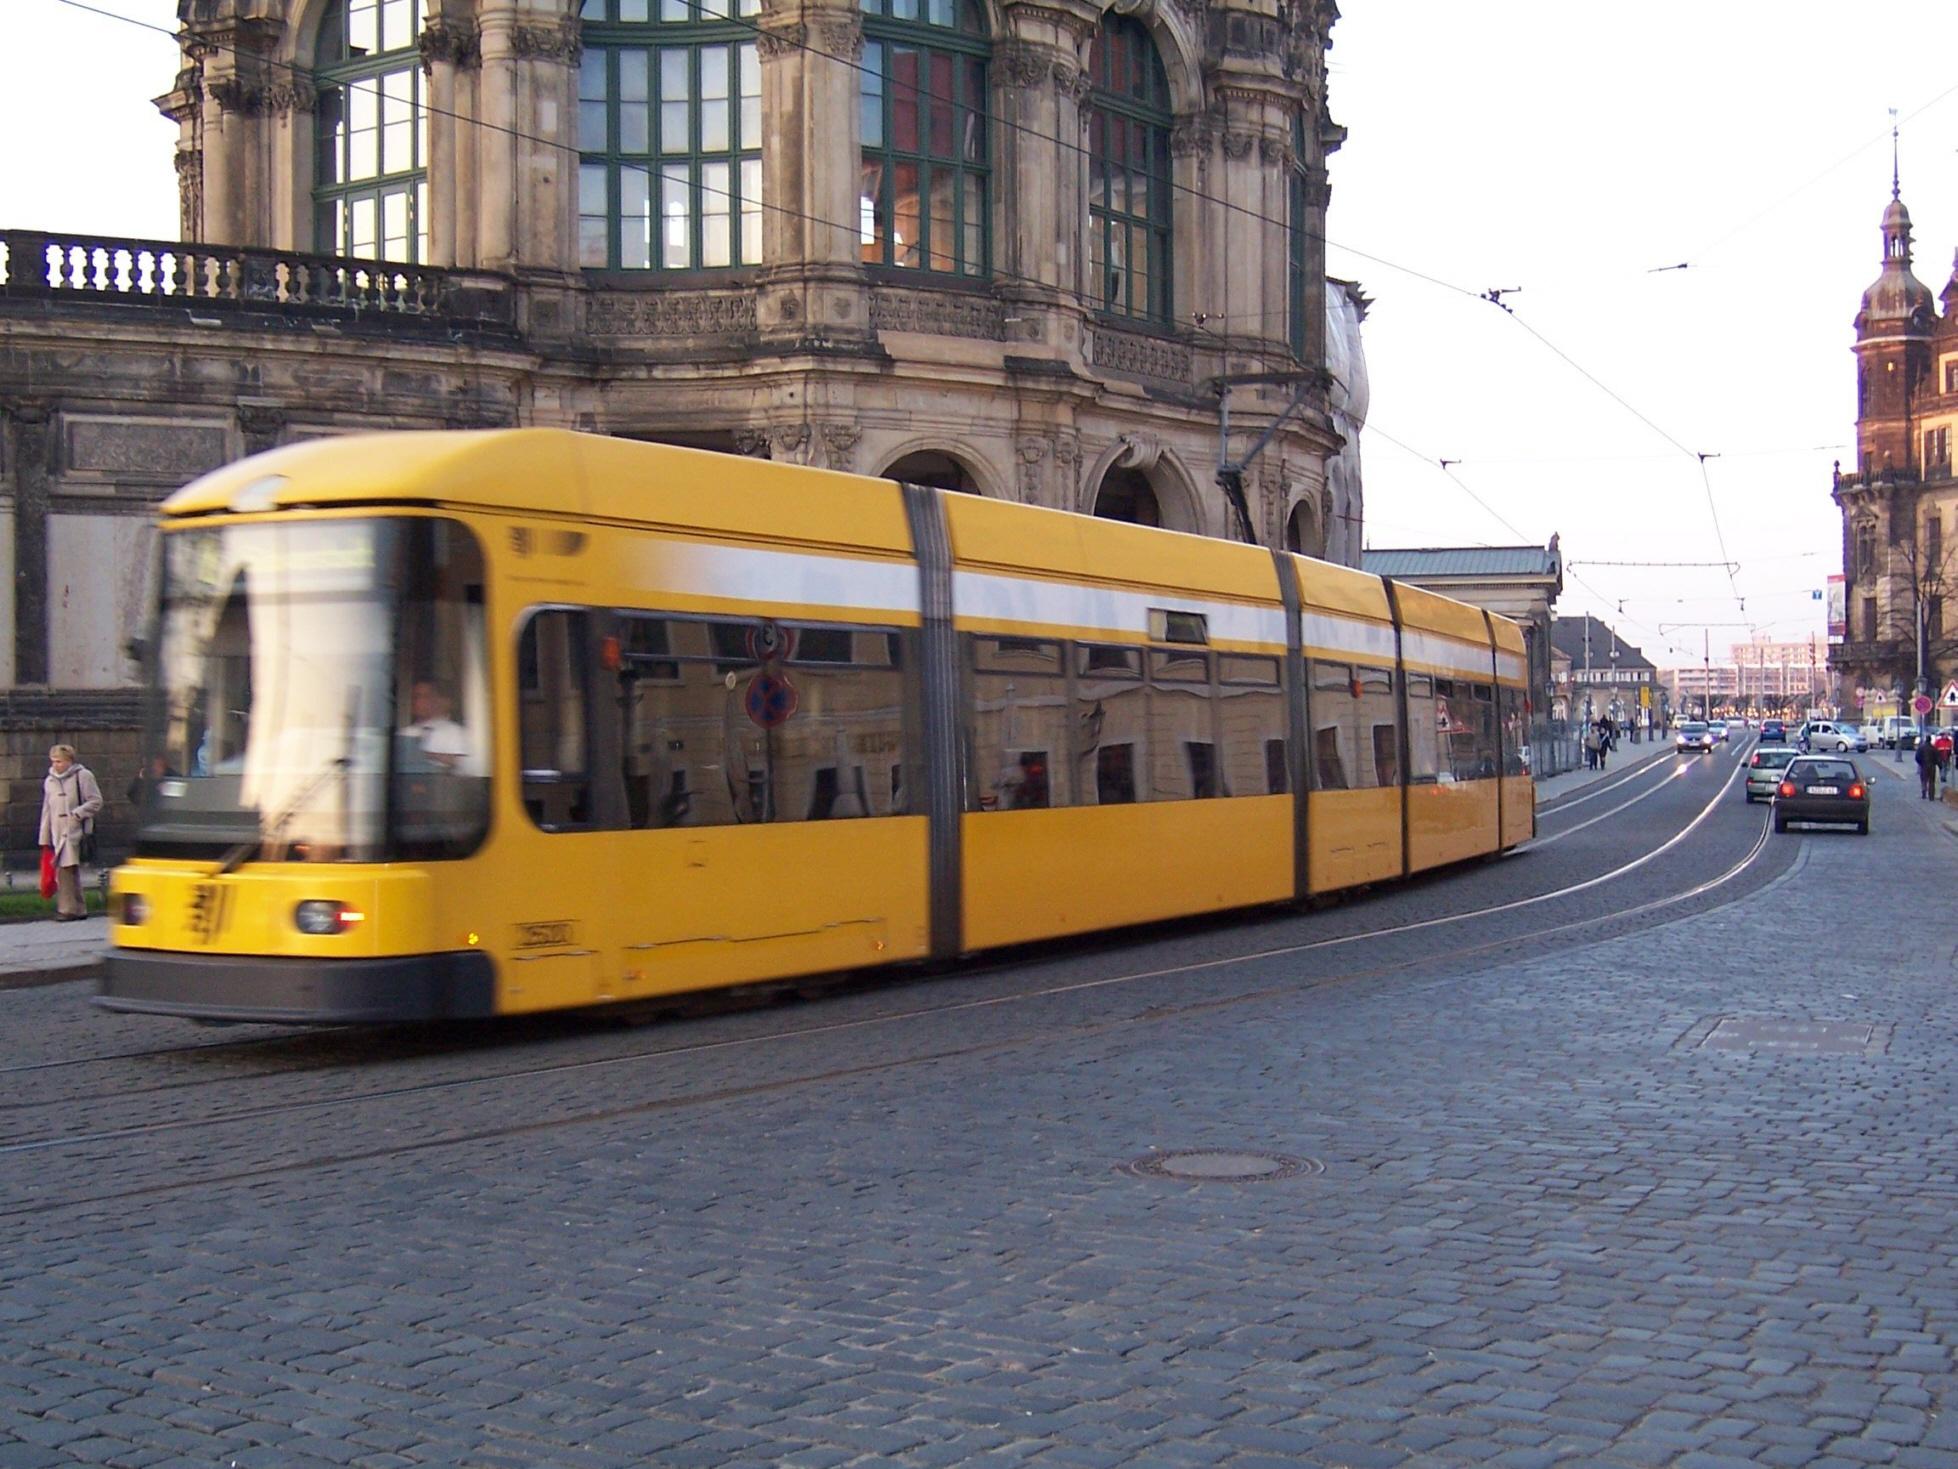 Straßenbahn (Tram) in der Dresdner Altstadt